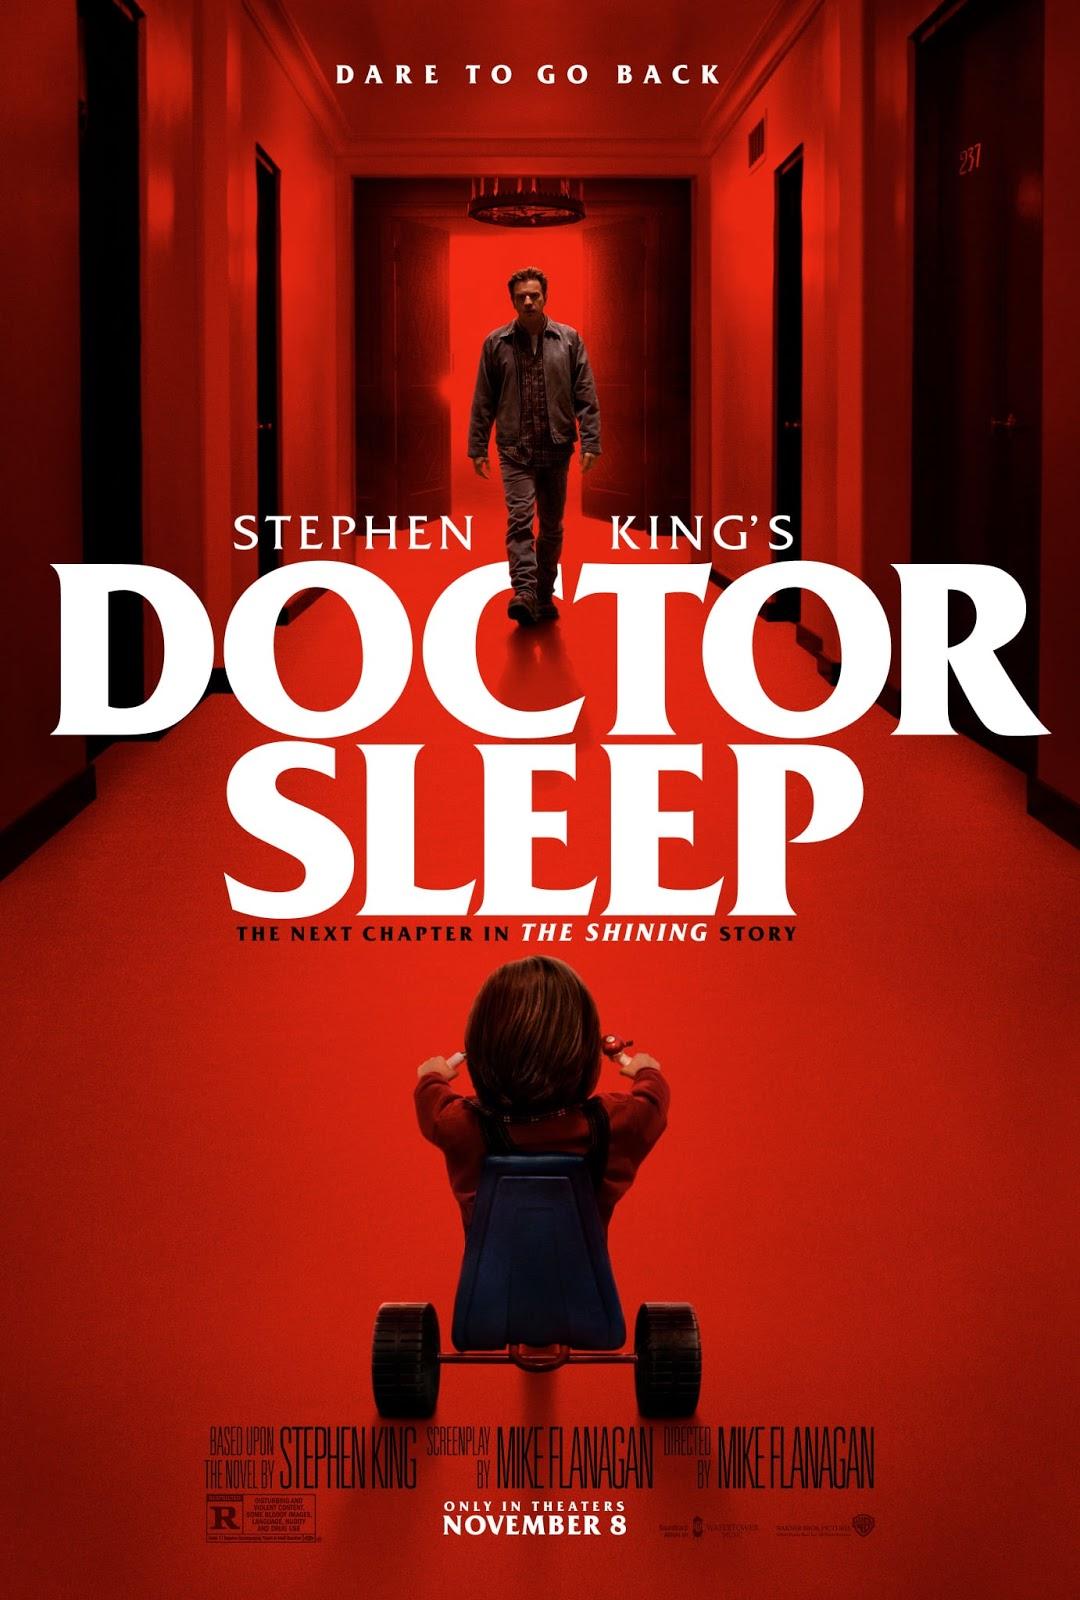 Downalod Full Movie Doctor Sleep 2019